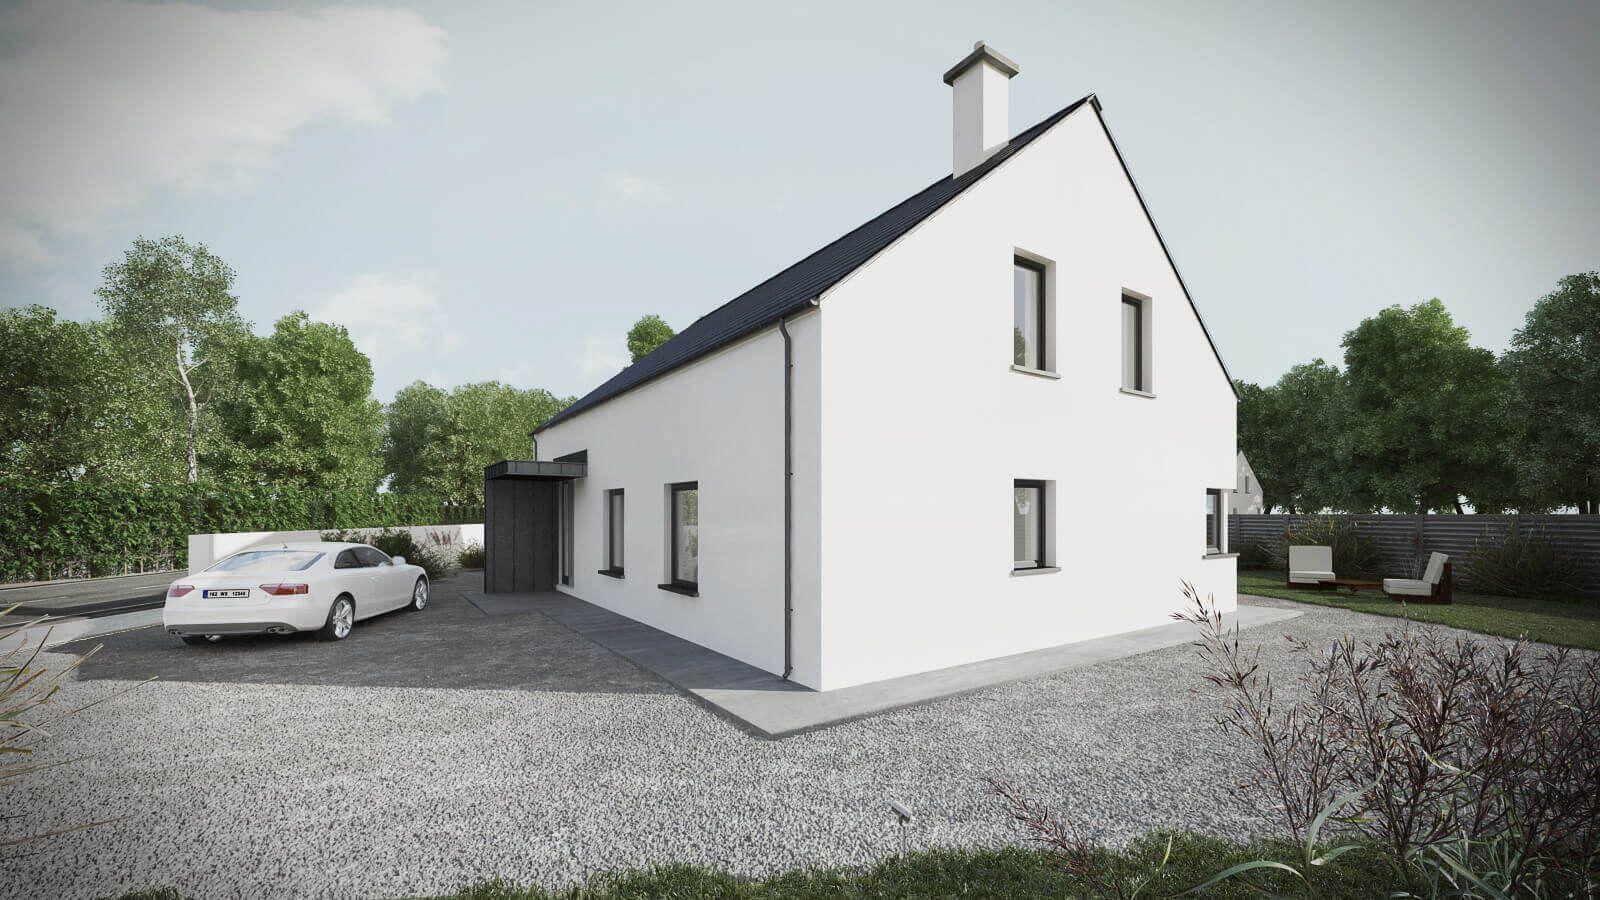 Pin On Low Density Housing Waterford